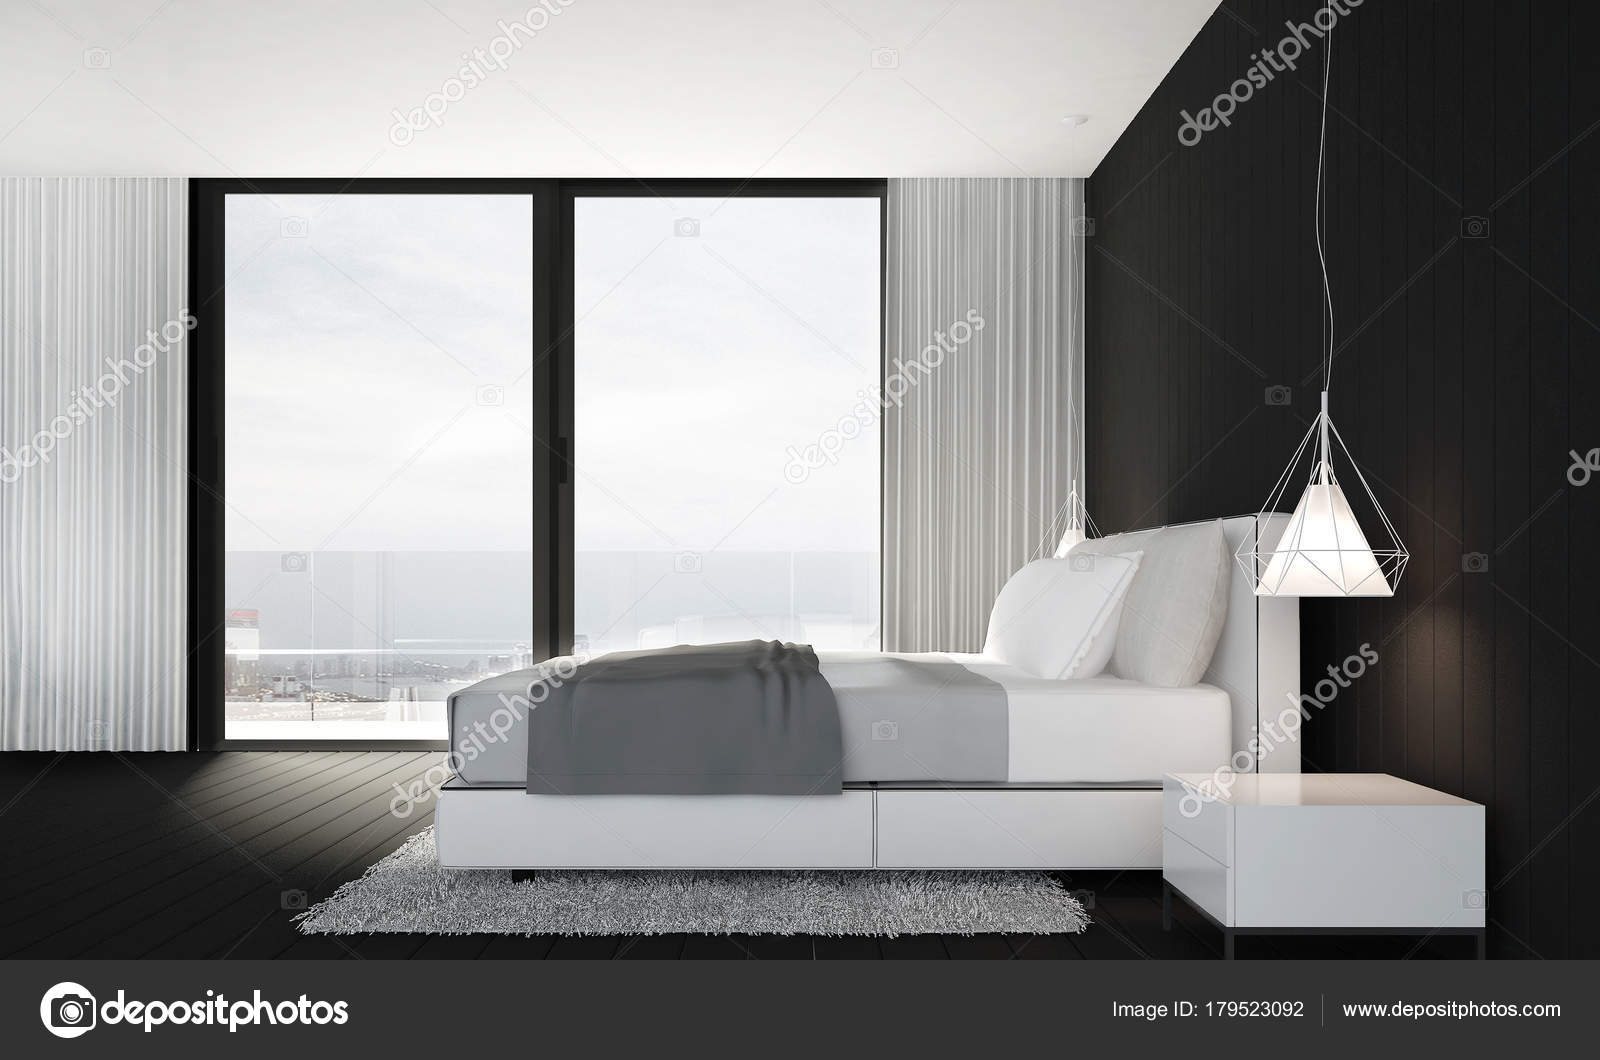 Rendu Décoration Chambre Coucher Moderne Fond Texture Mur Noir ...